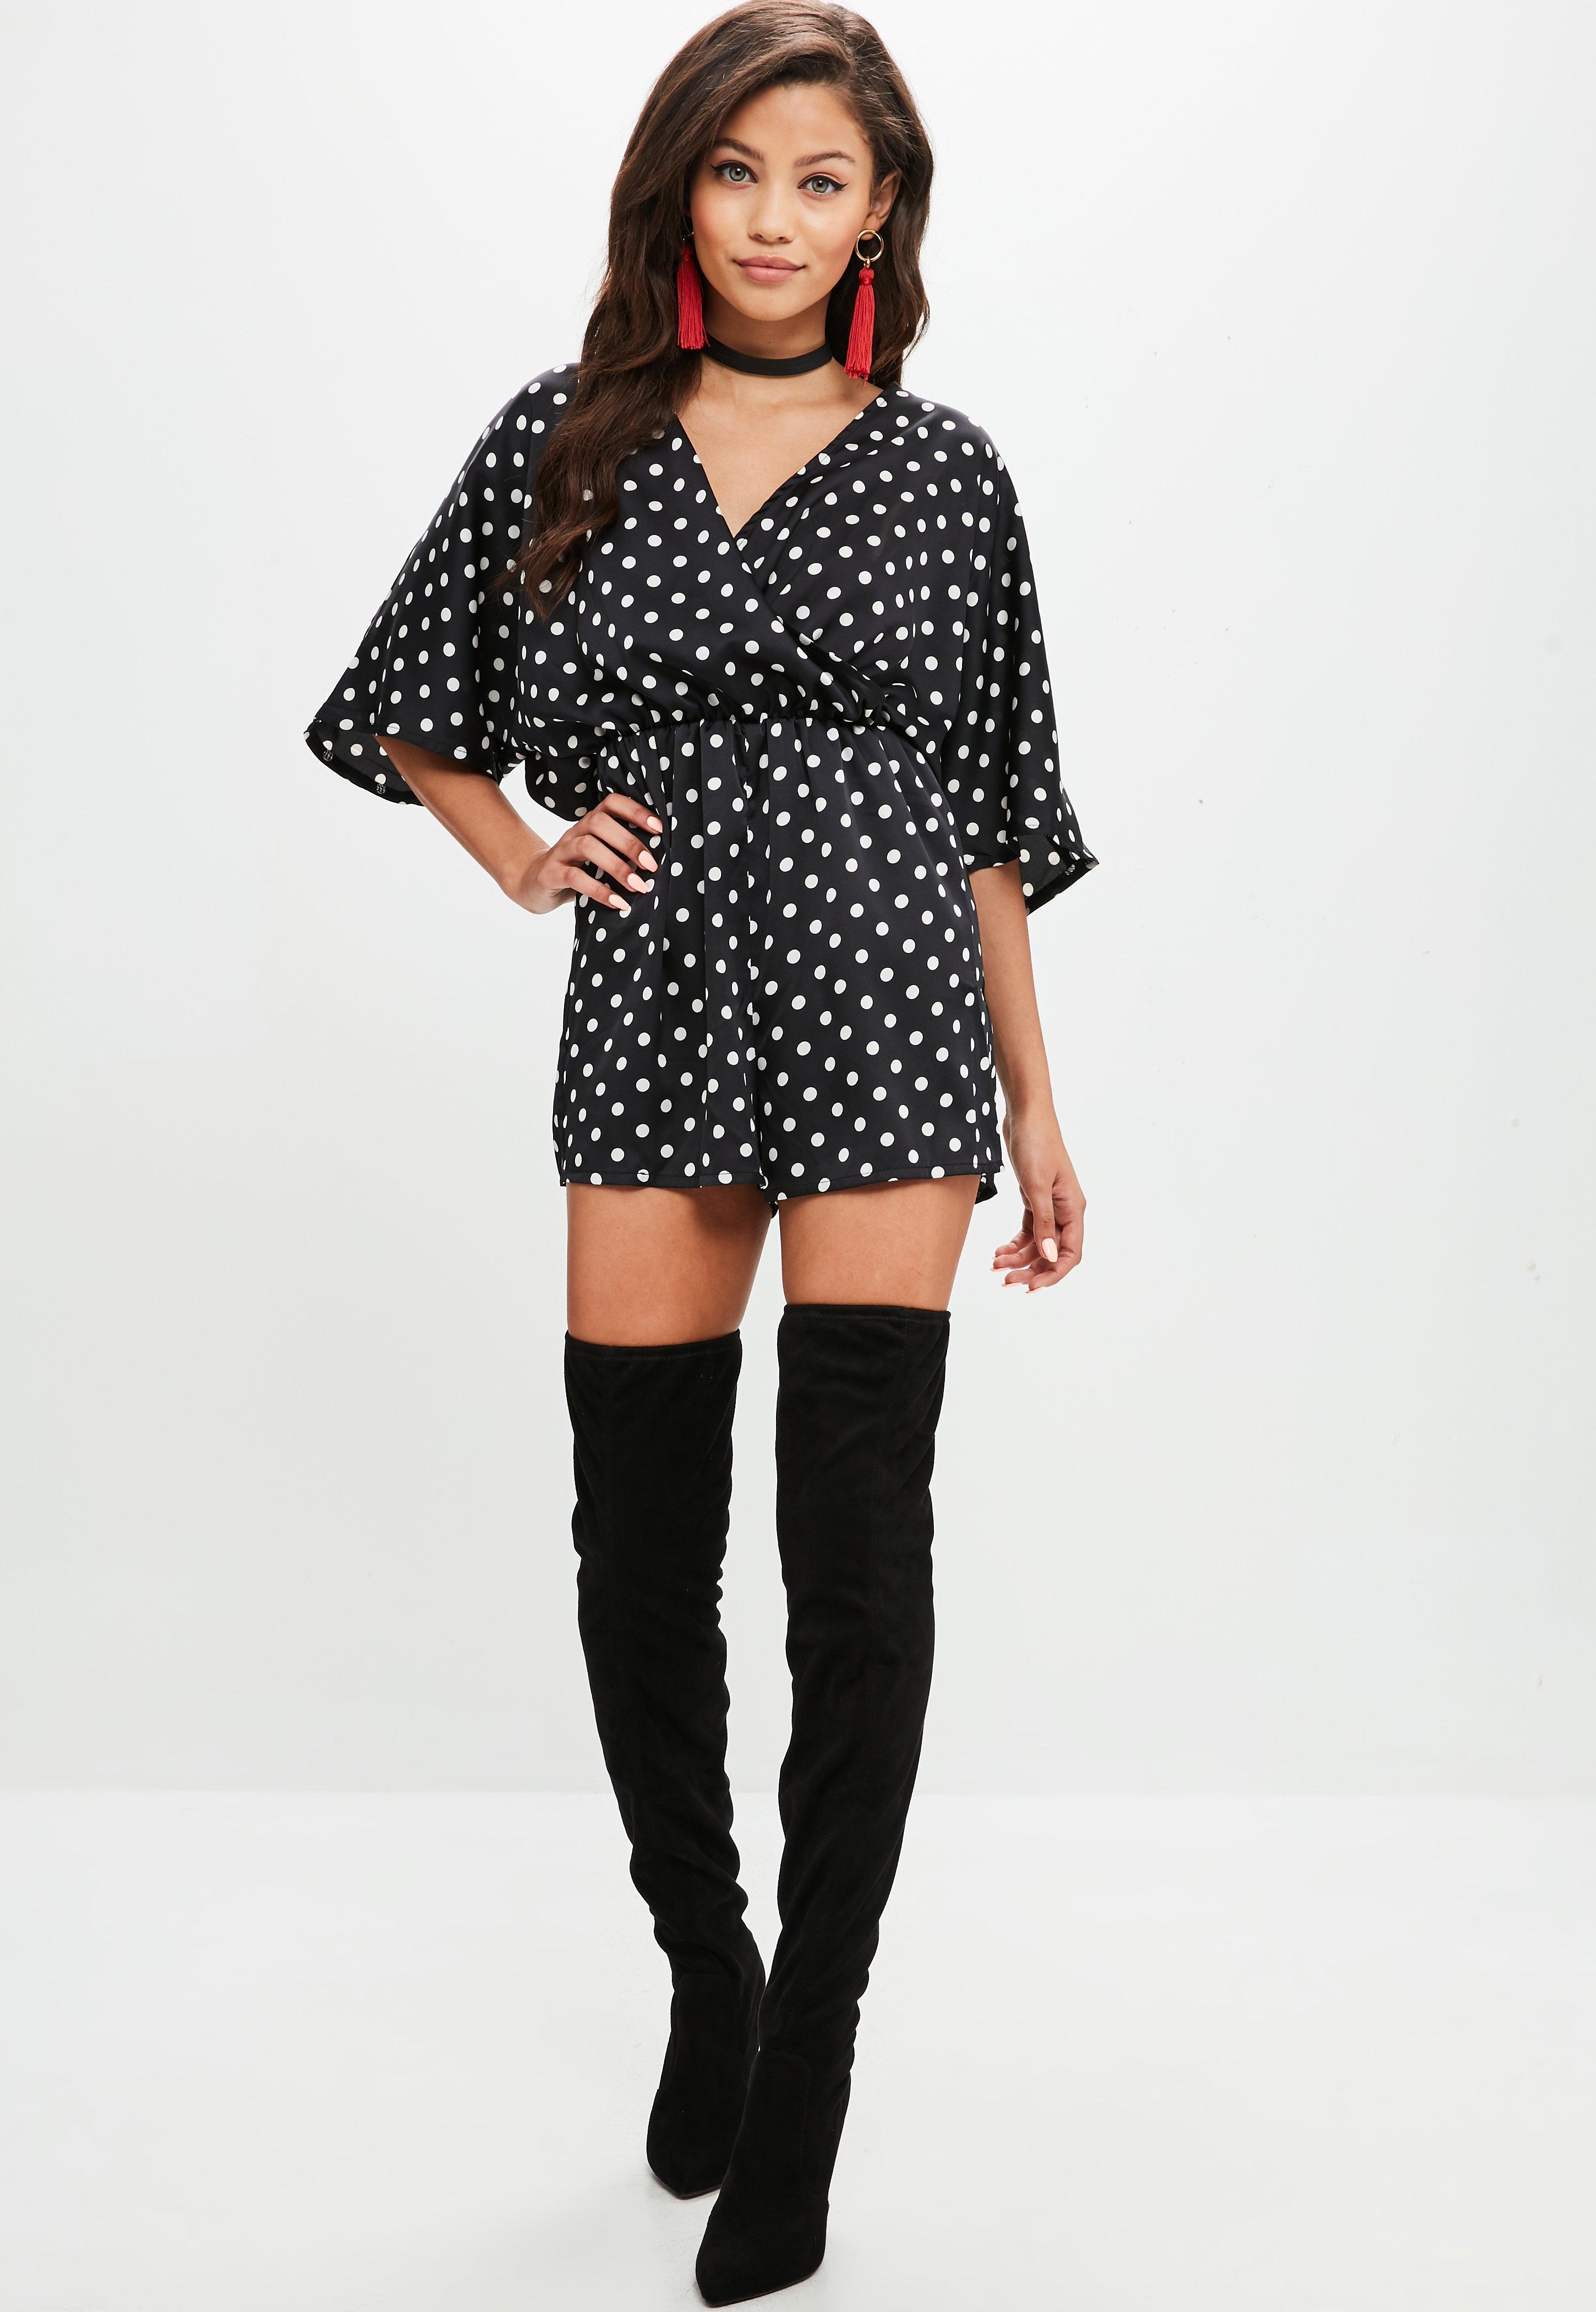 612dcc6ae1f Lyst - Missguided Black Polka Dot Kimono Sleeve Playsuit in Black